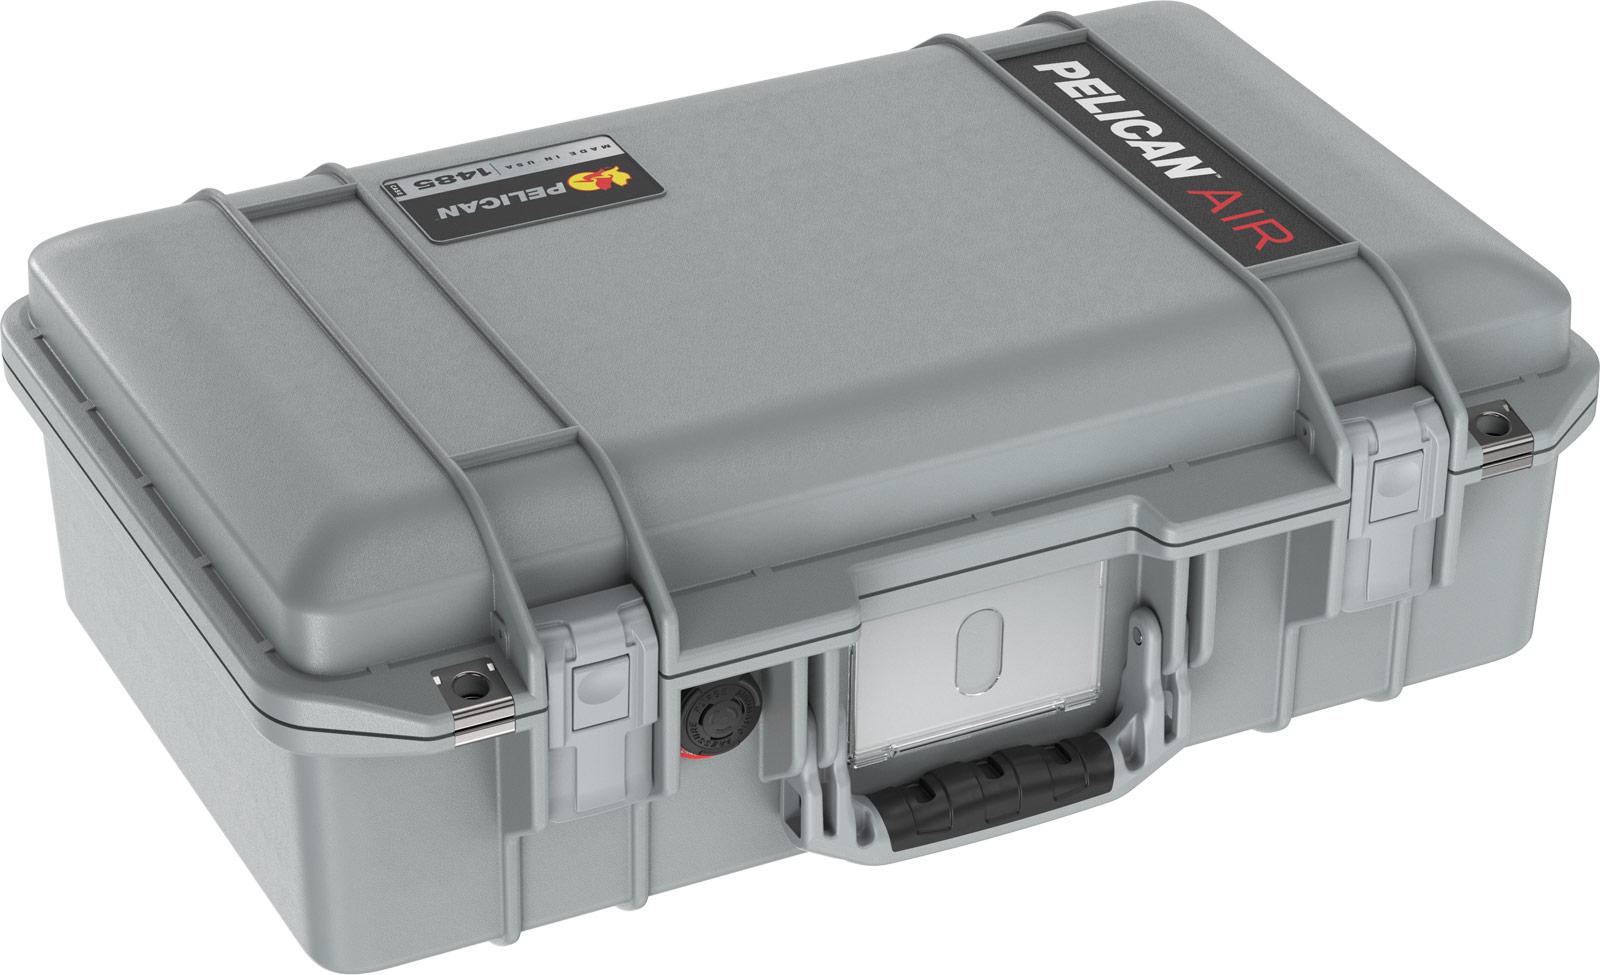 pelican air case watertight cases 1485